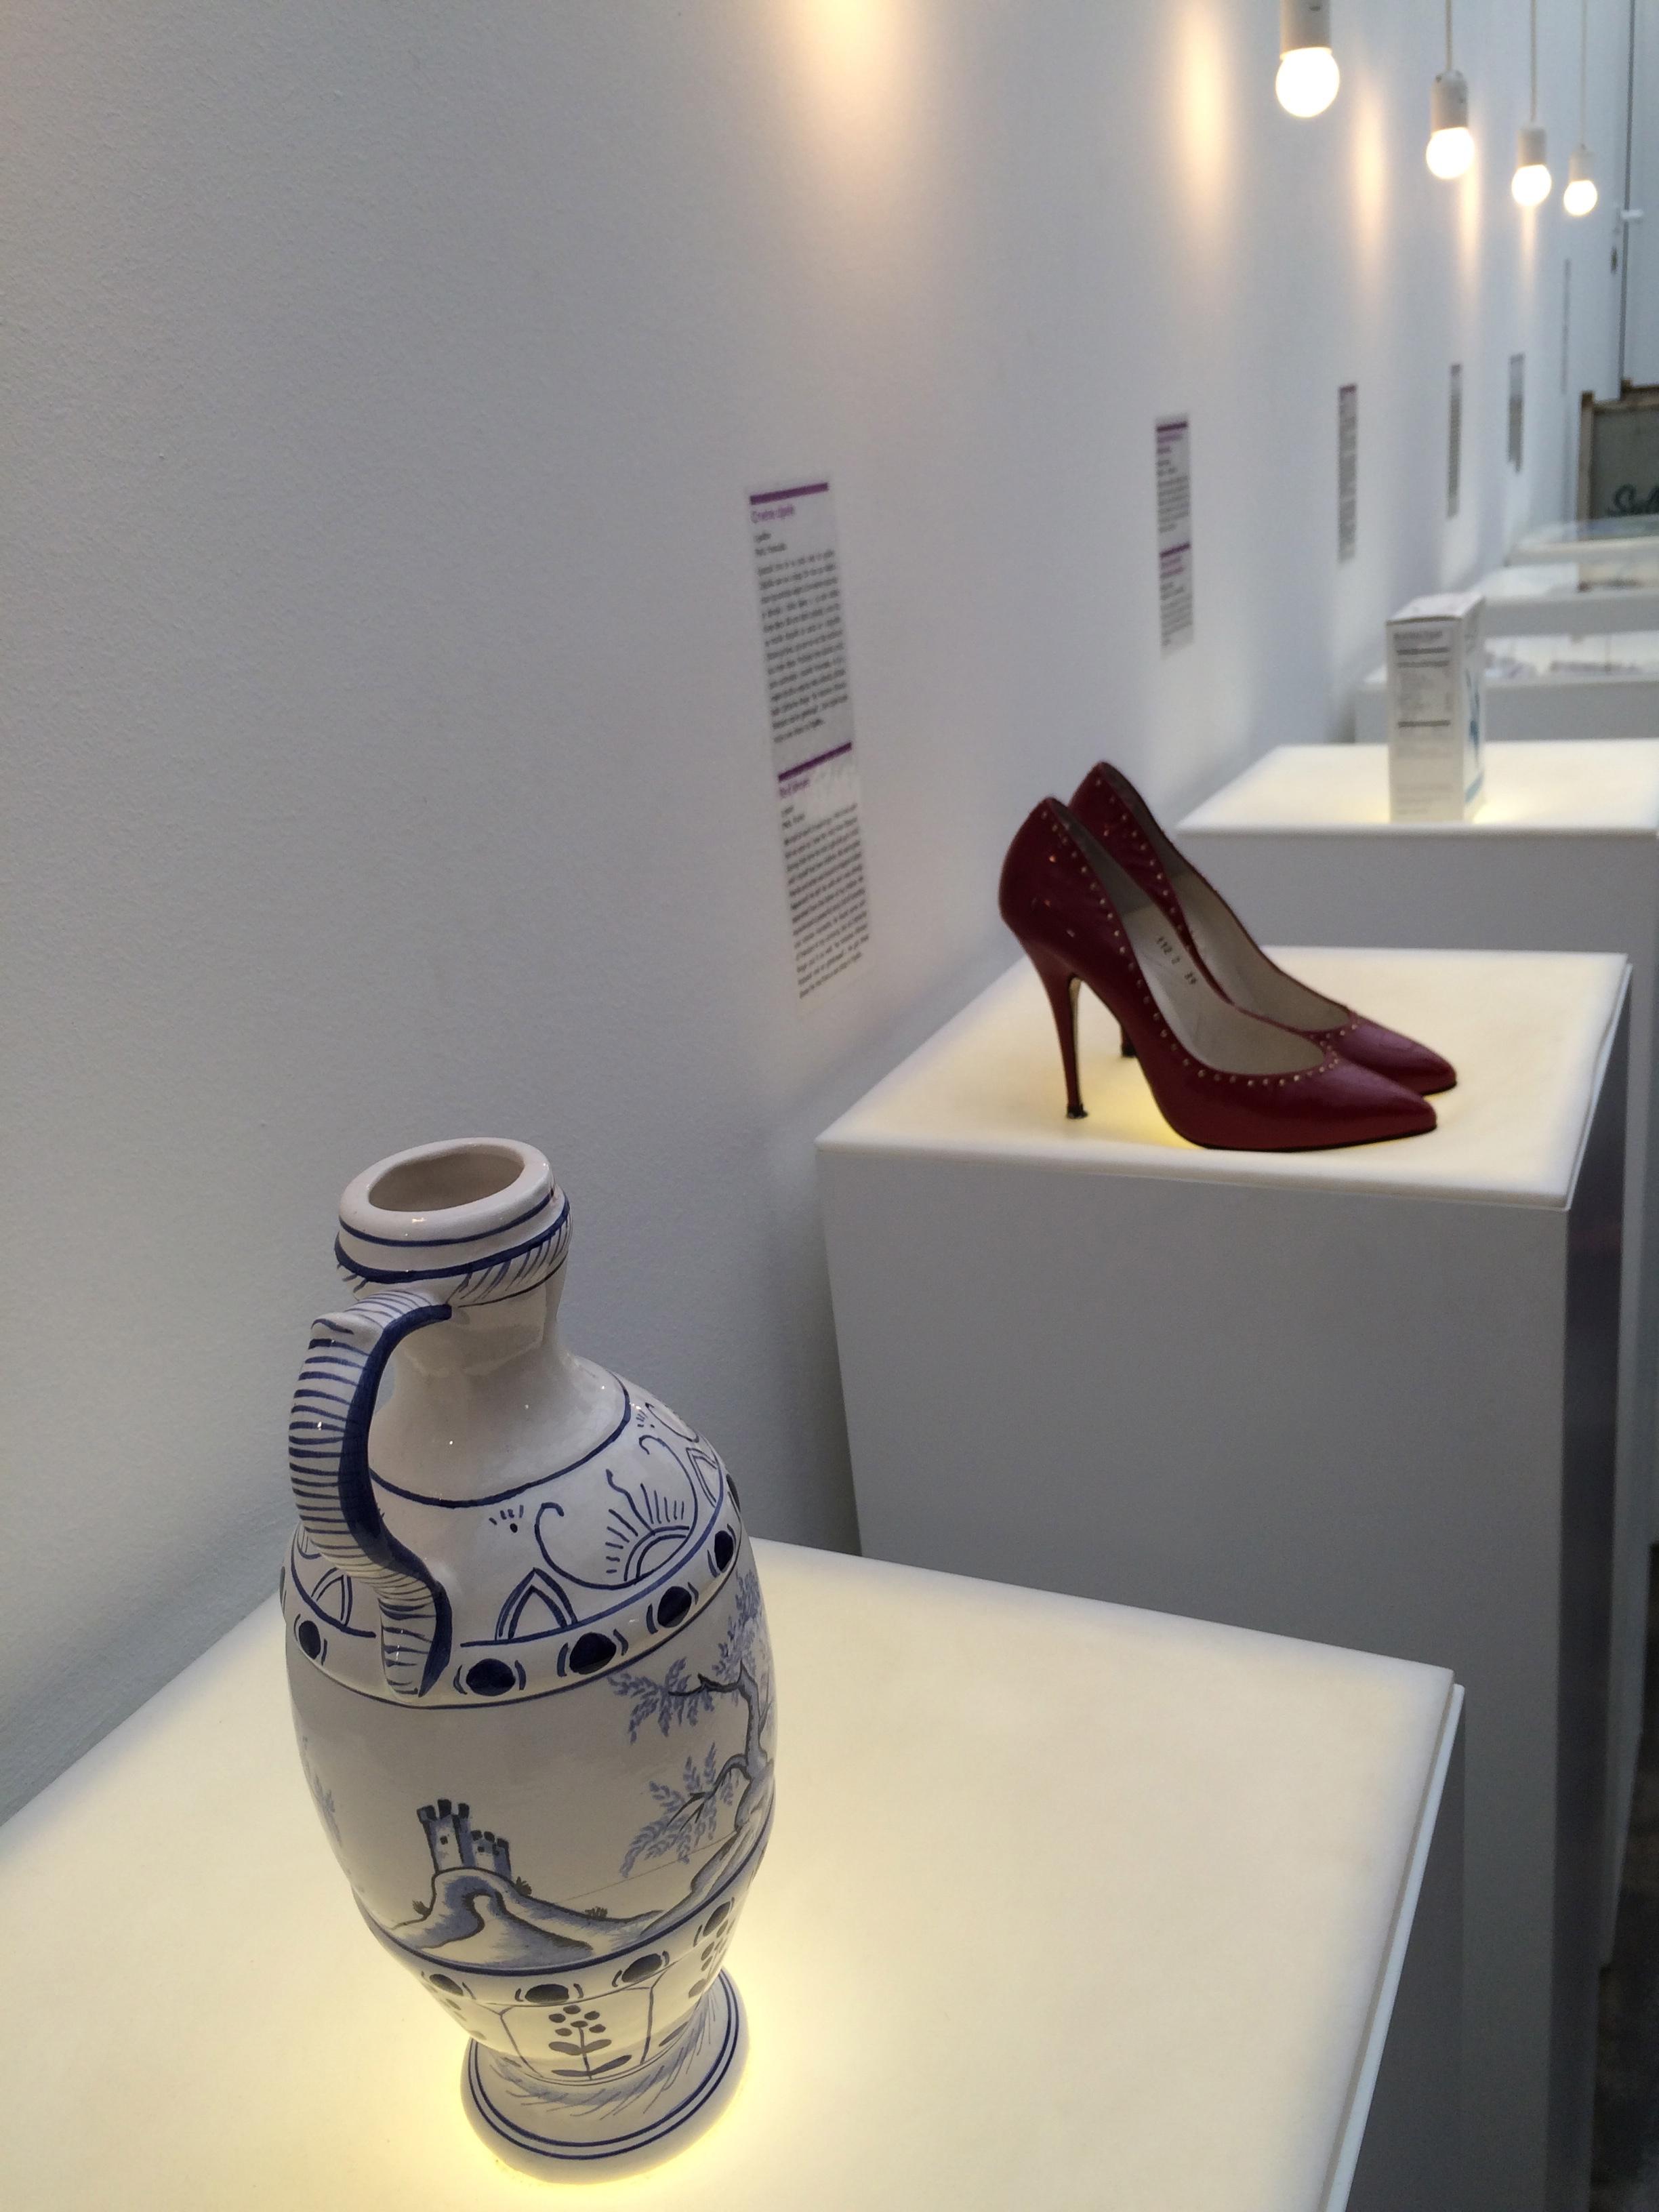 Museum of Broken Relationships, Zagreb - cultivatedrambler.com